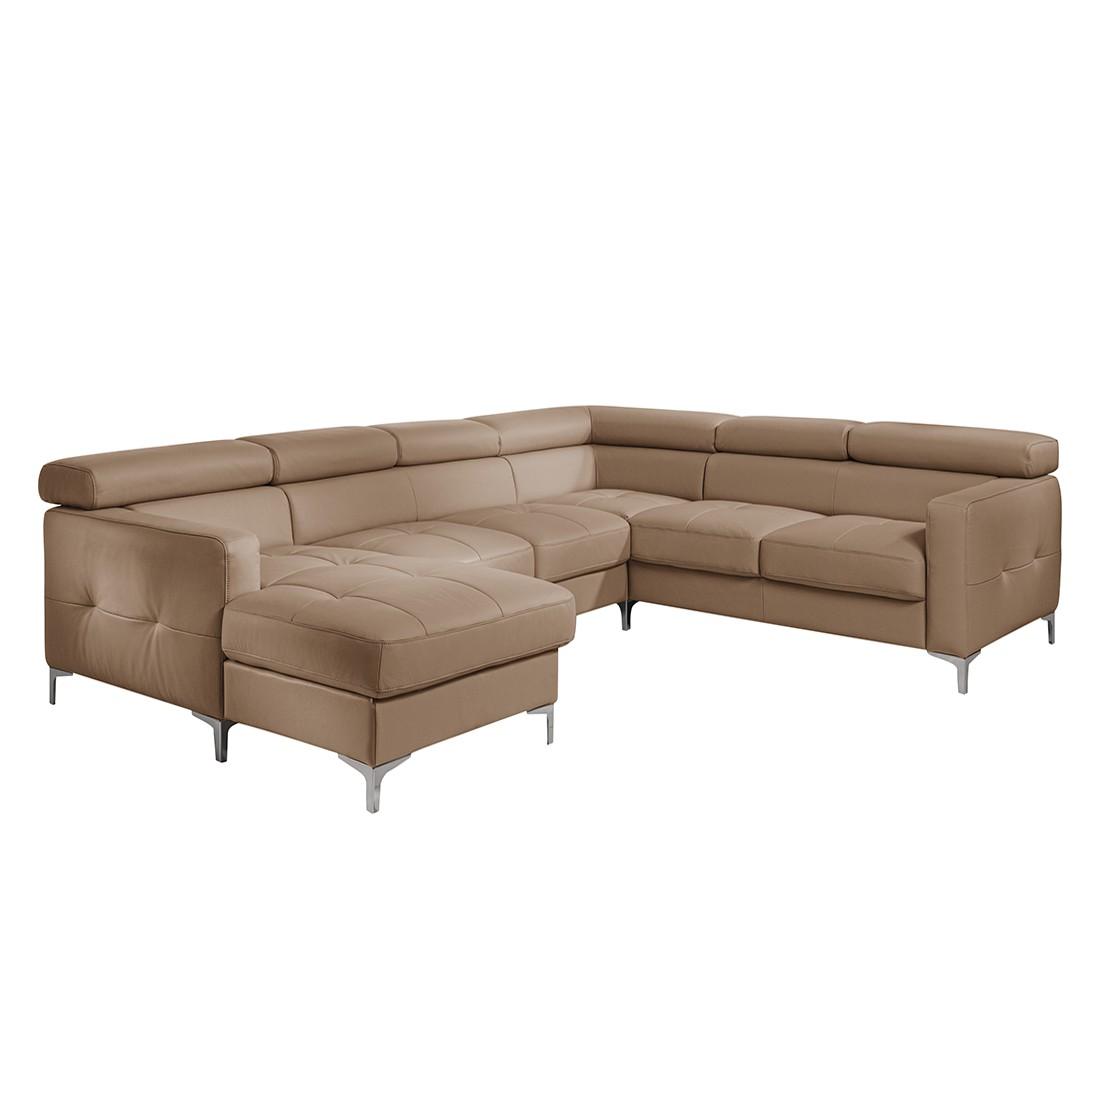 wohnlandschaften leder mit relaxfunktion preisvergleiche. Black Bedroom Furniture Sets. Home Design Ideas